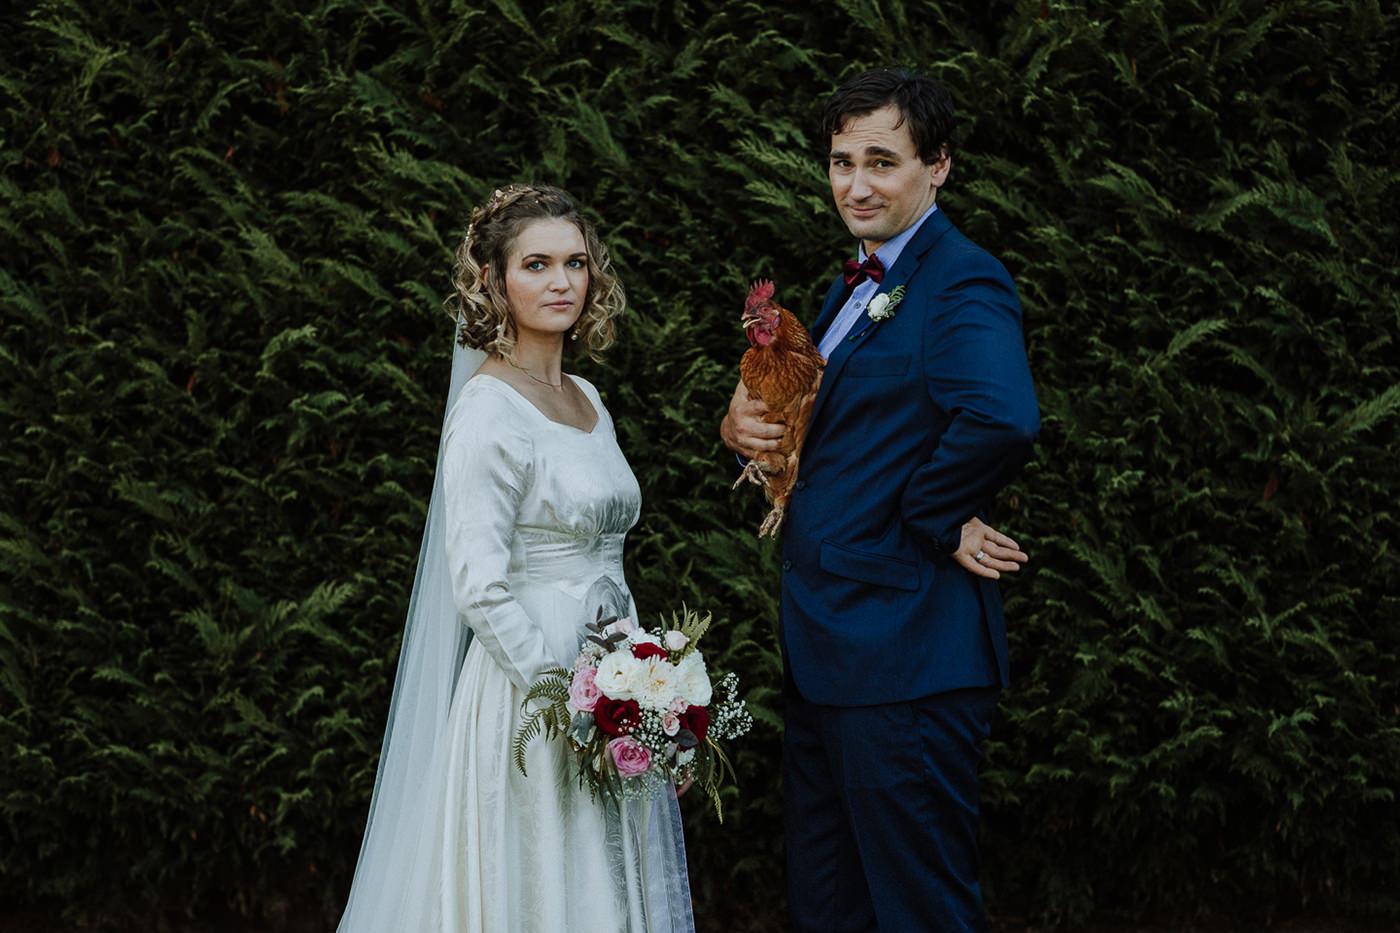 wedding_photographer_nz-00022.jpg